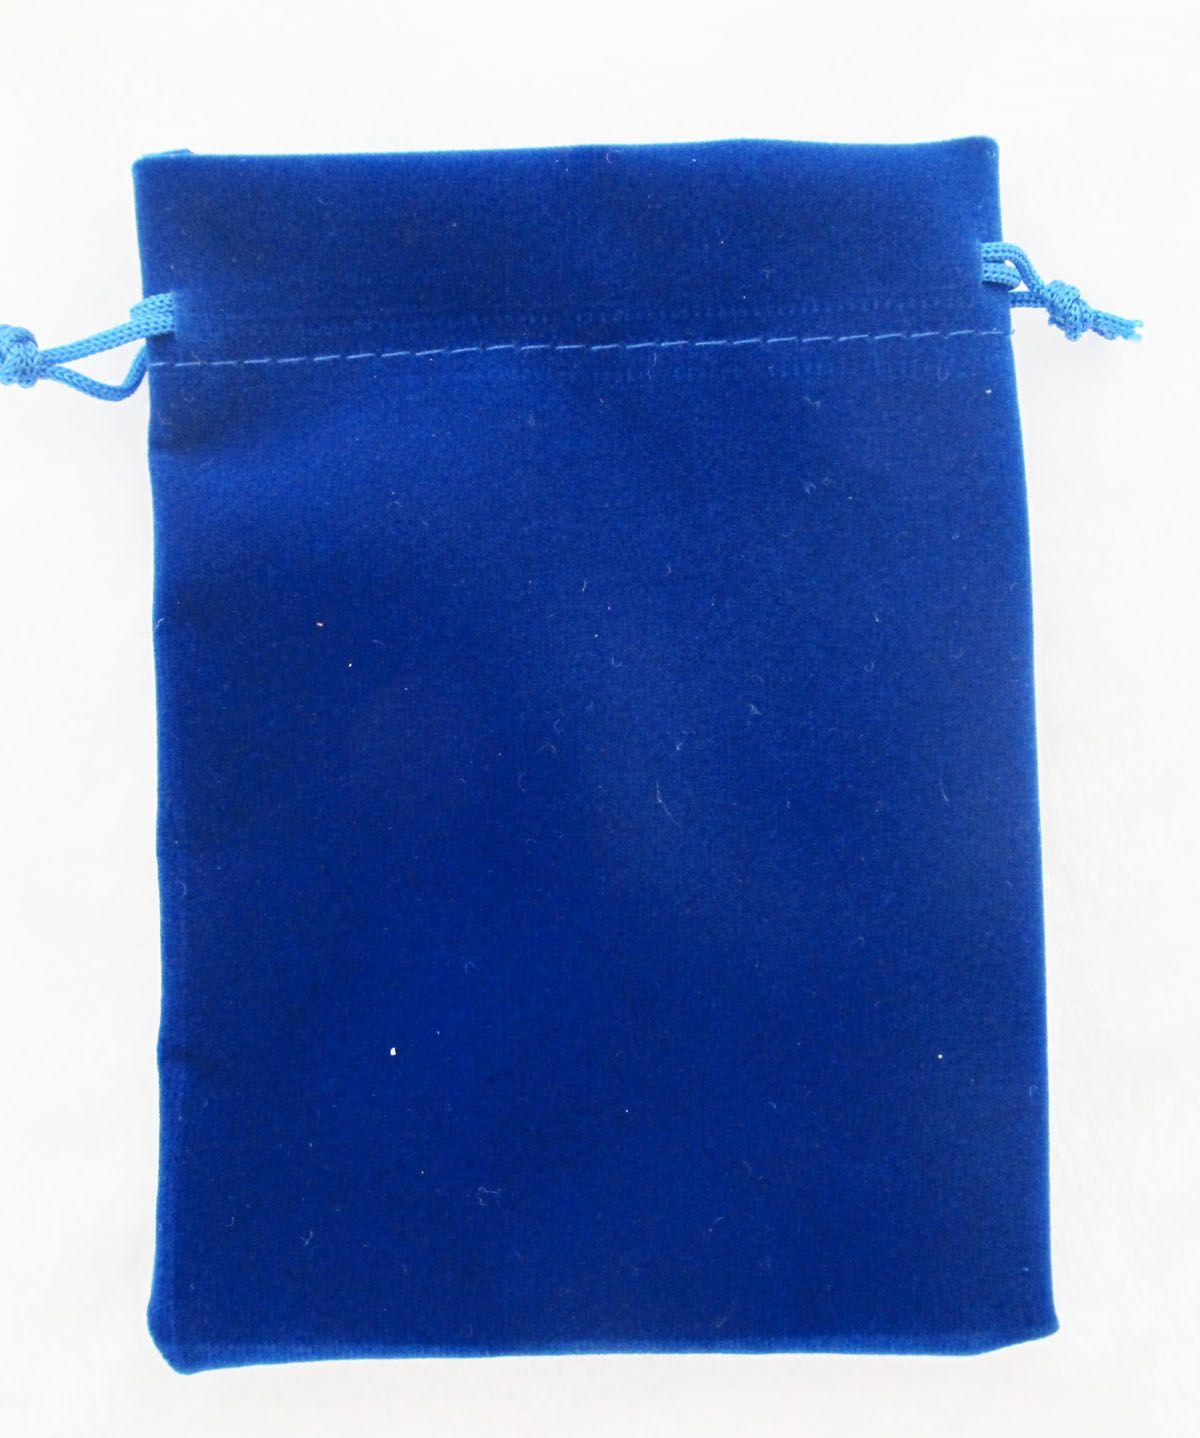 Blue Velour Velvet Bag Jewelry Pouch 11 X 15 cm  4.3 x 5.9 inch  Gift Bags